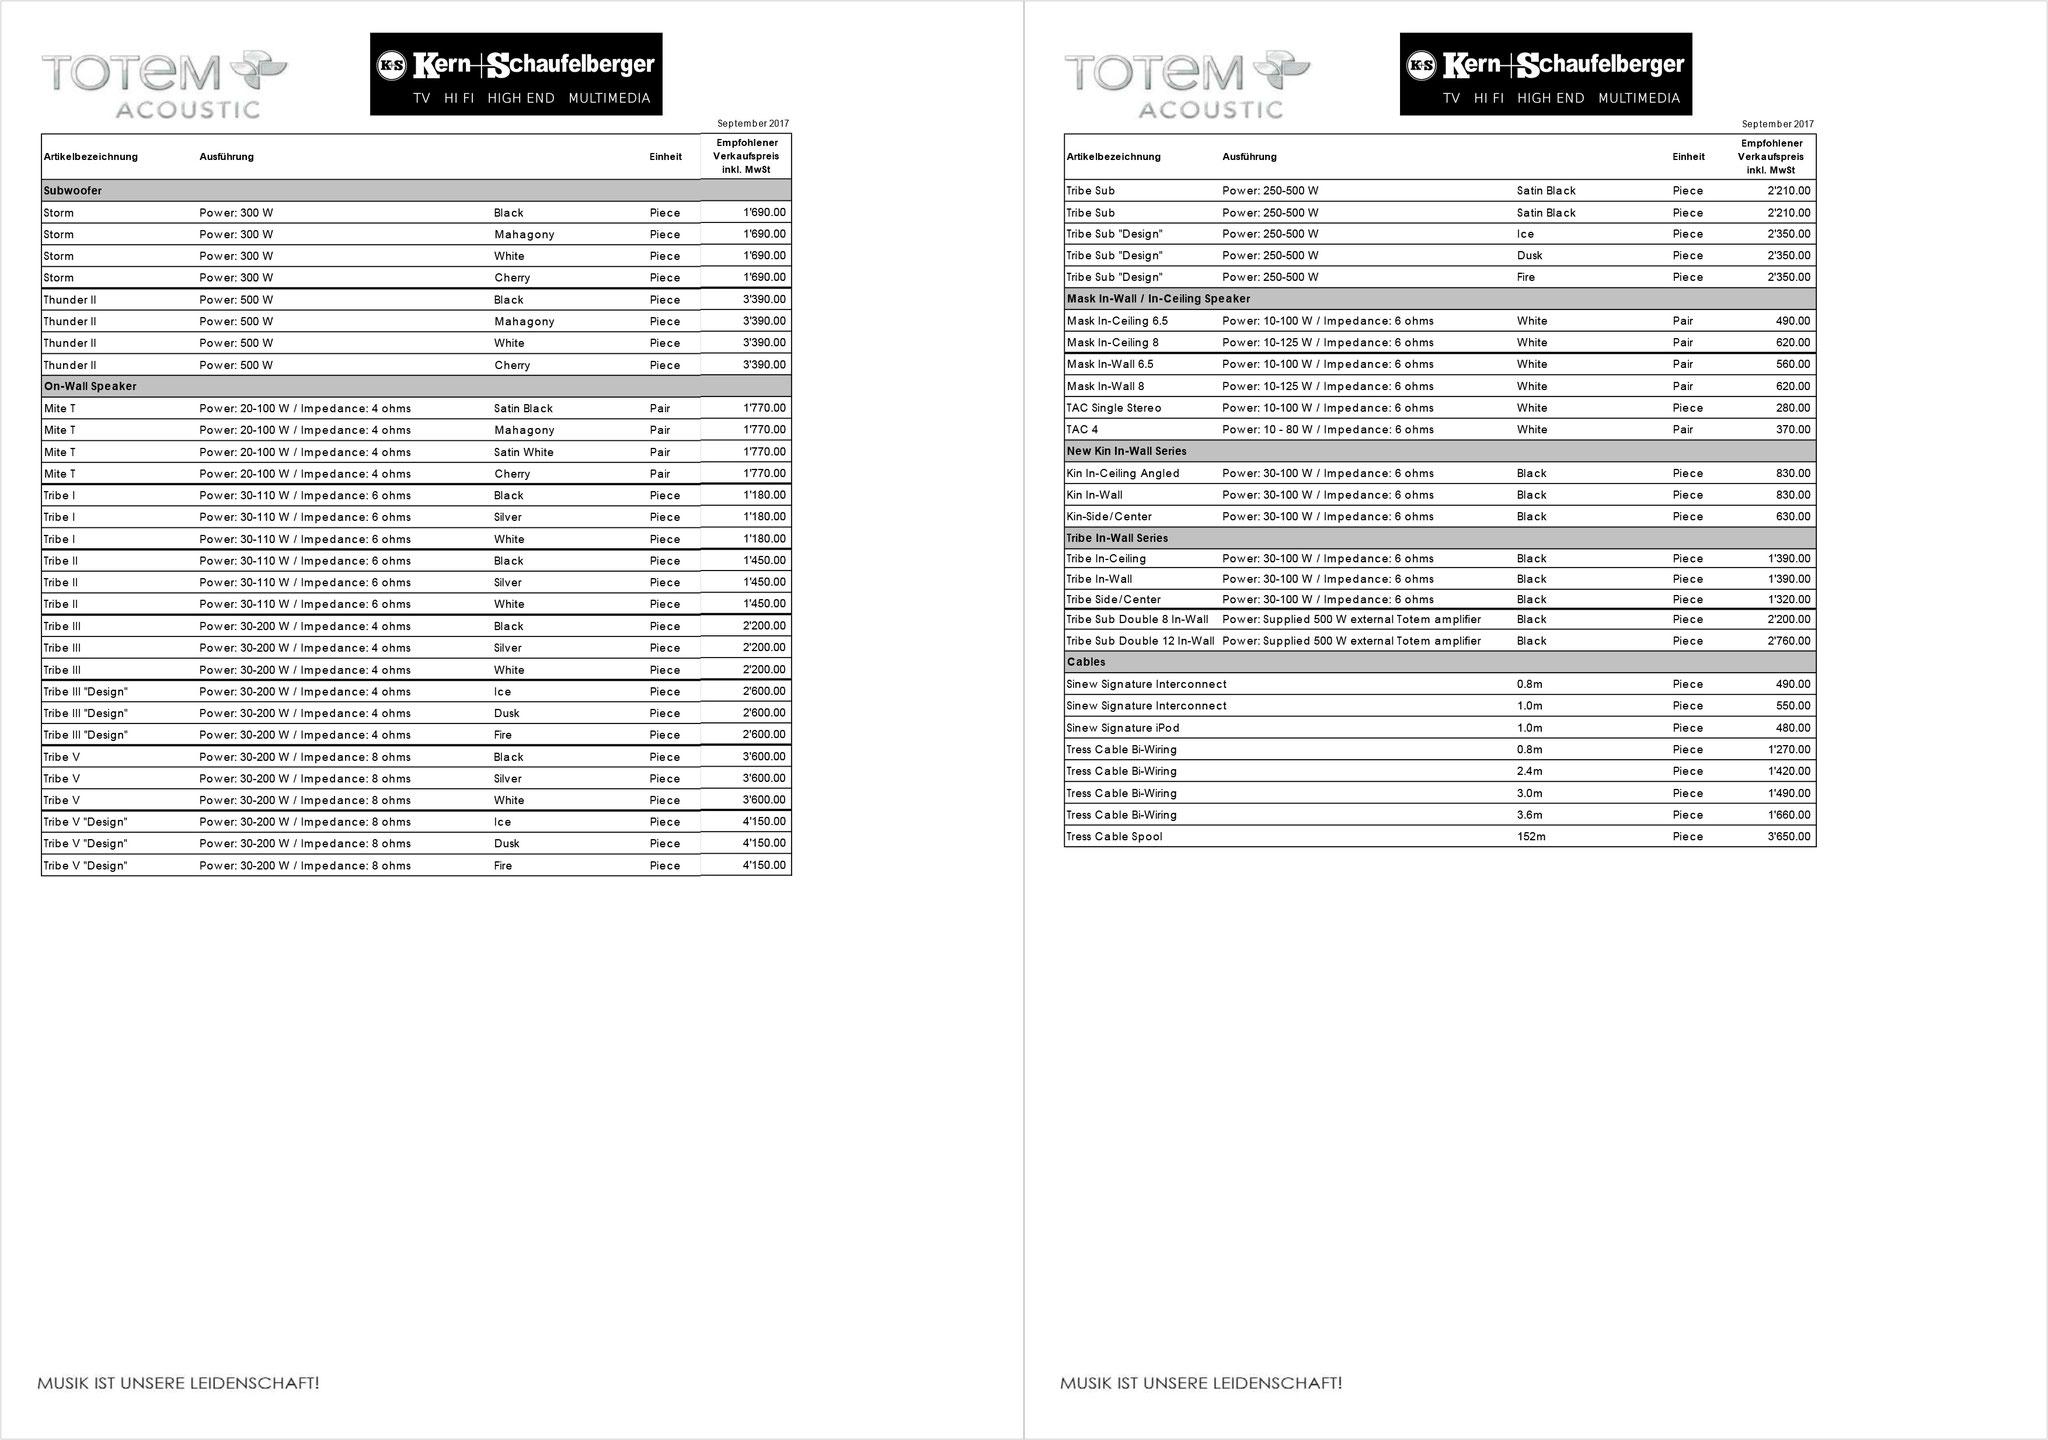 Totem Acoustic Preisliste 2/2